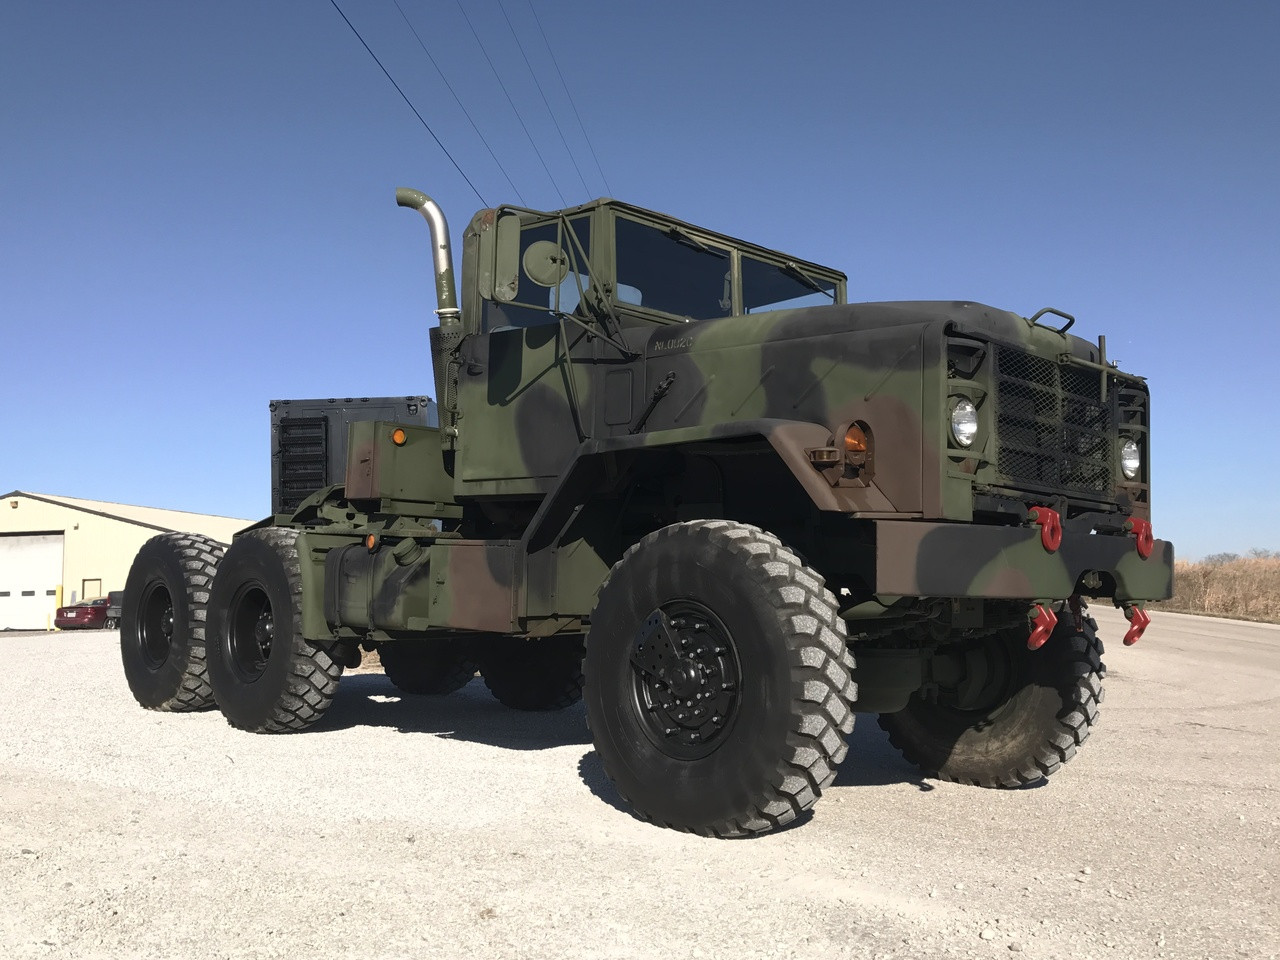 Rebuilt Bmy 5 Ton M931a2 Military Semi Truck 6x6 Midwest Military